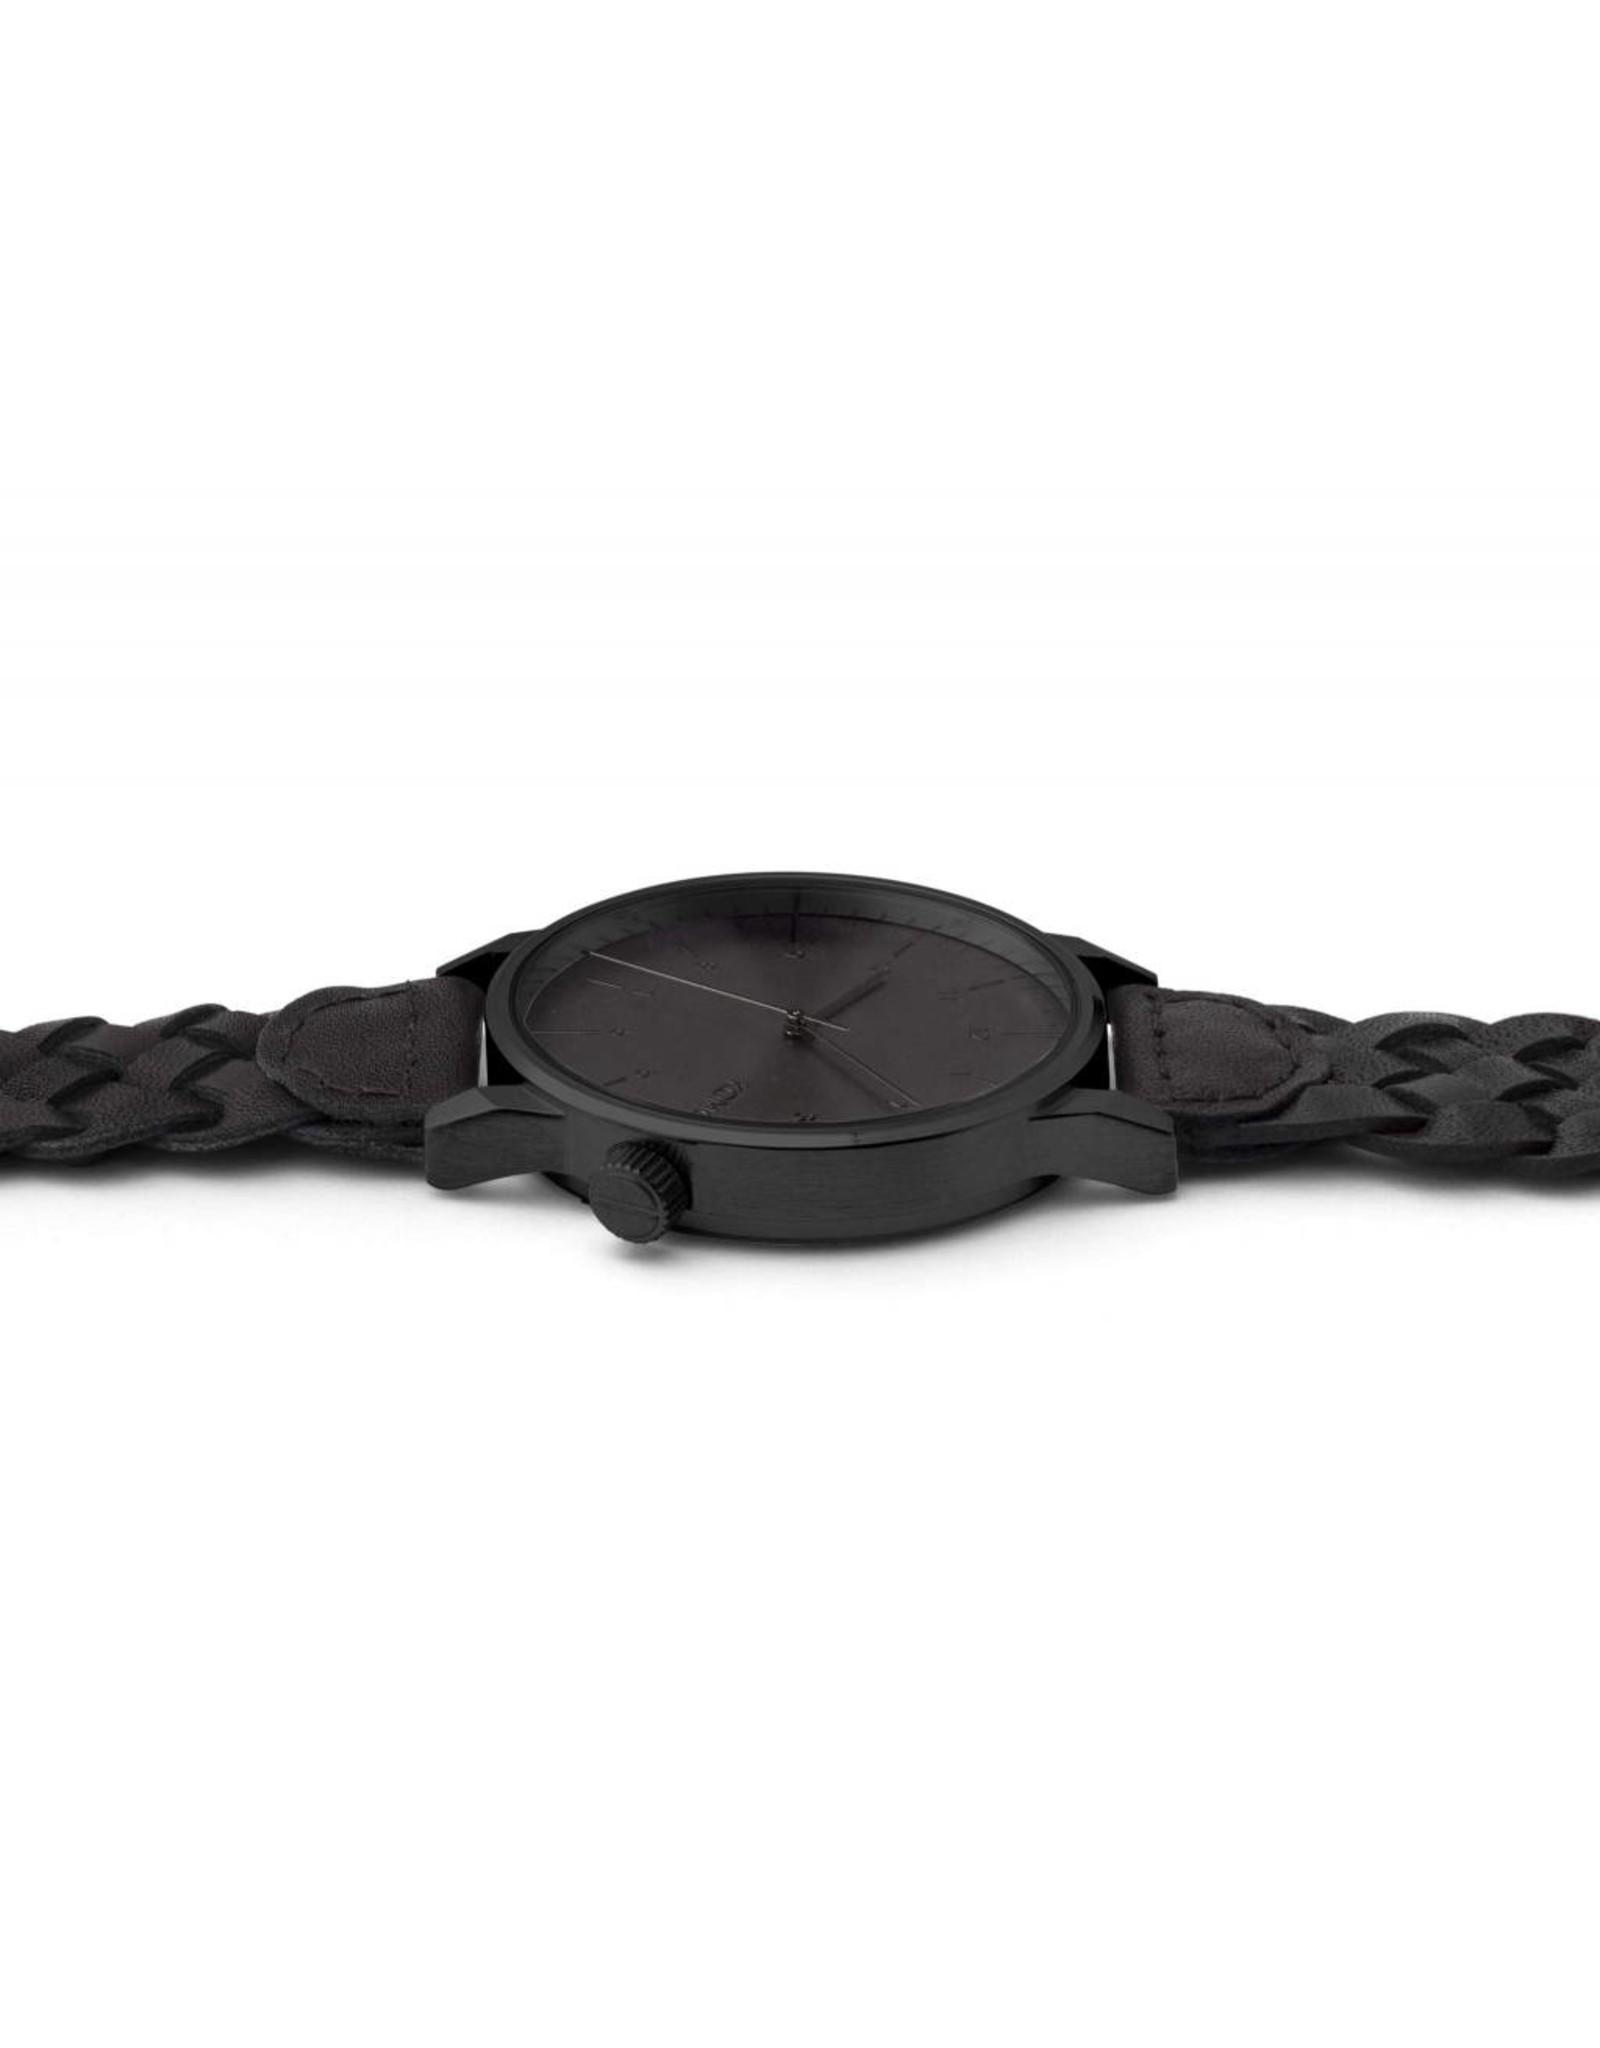 Komono Komono Winston Woven-All Black